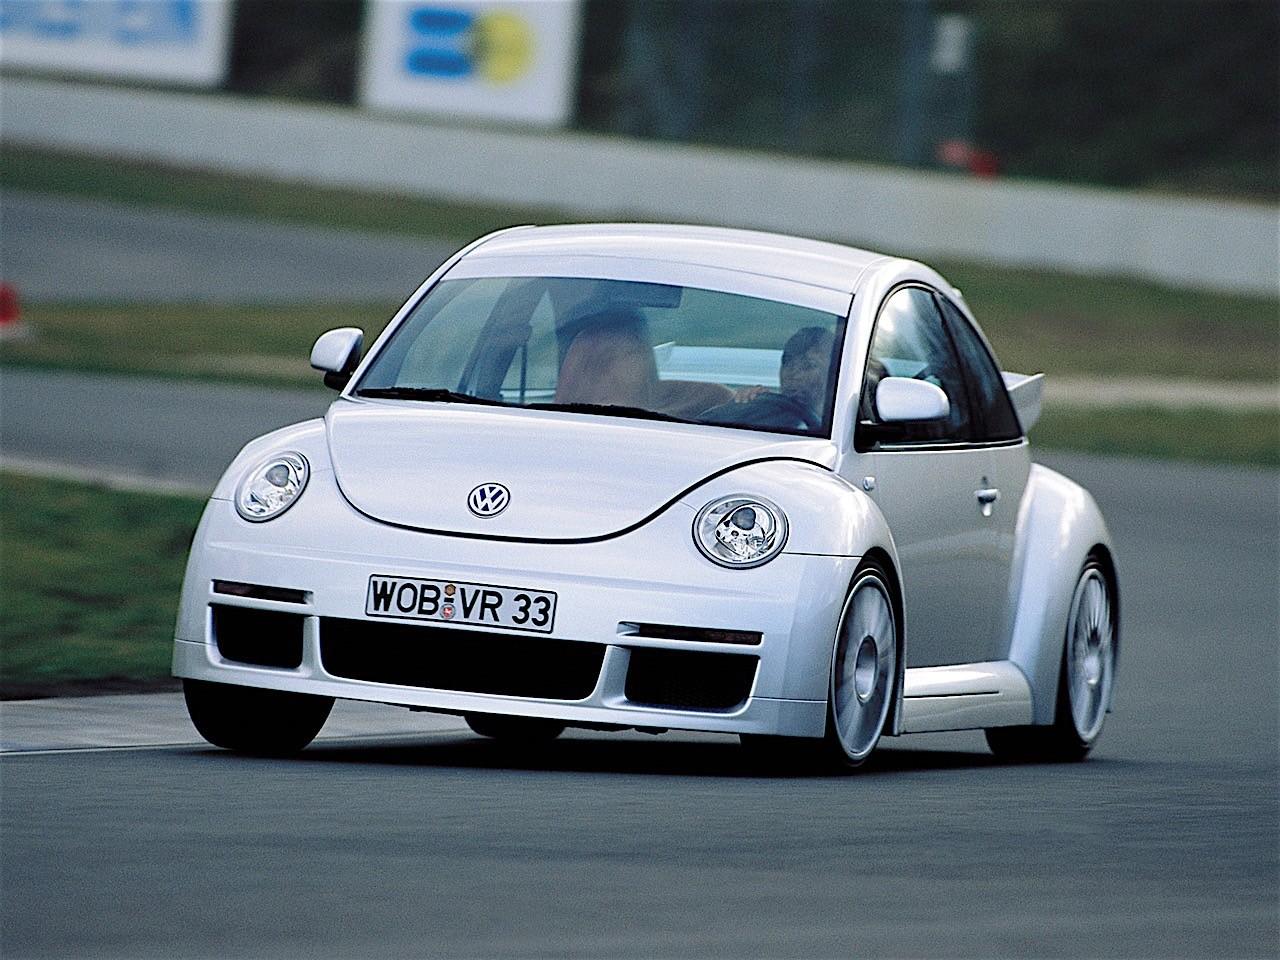 VOLKSWAGEN BEETLE RSI specs & photos - 2001, 2002 - autoevolution